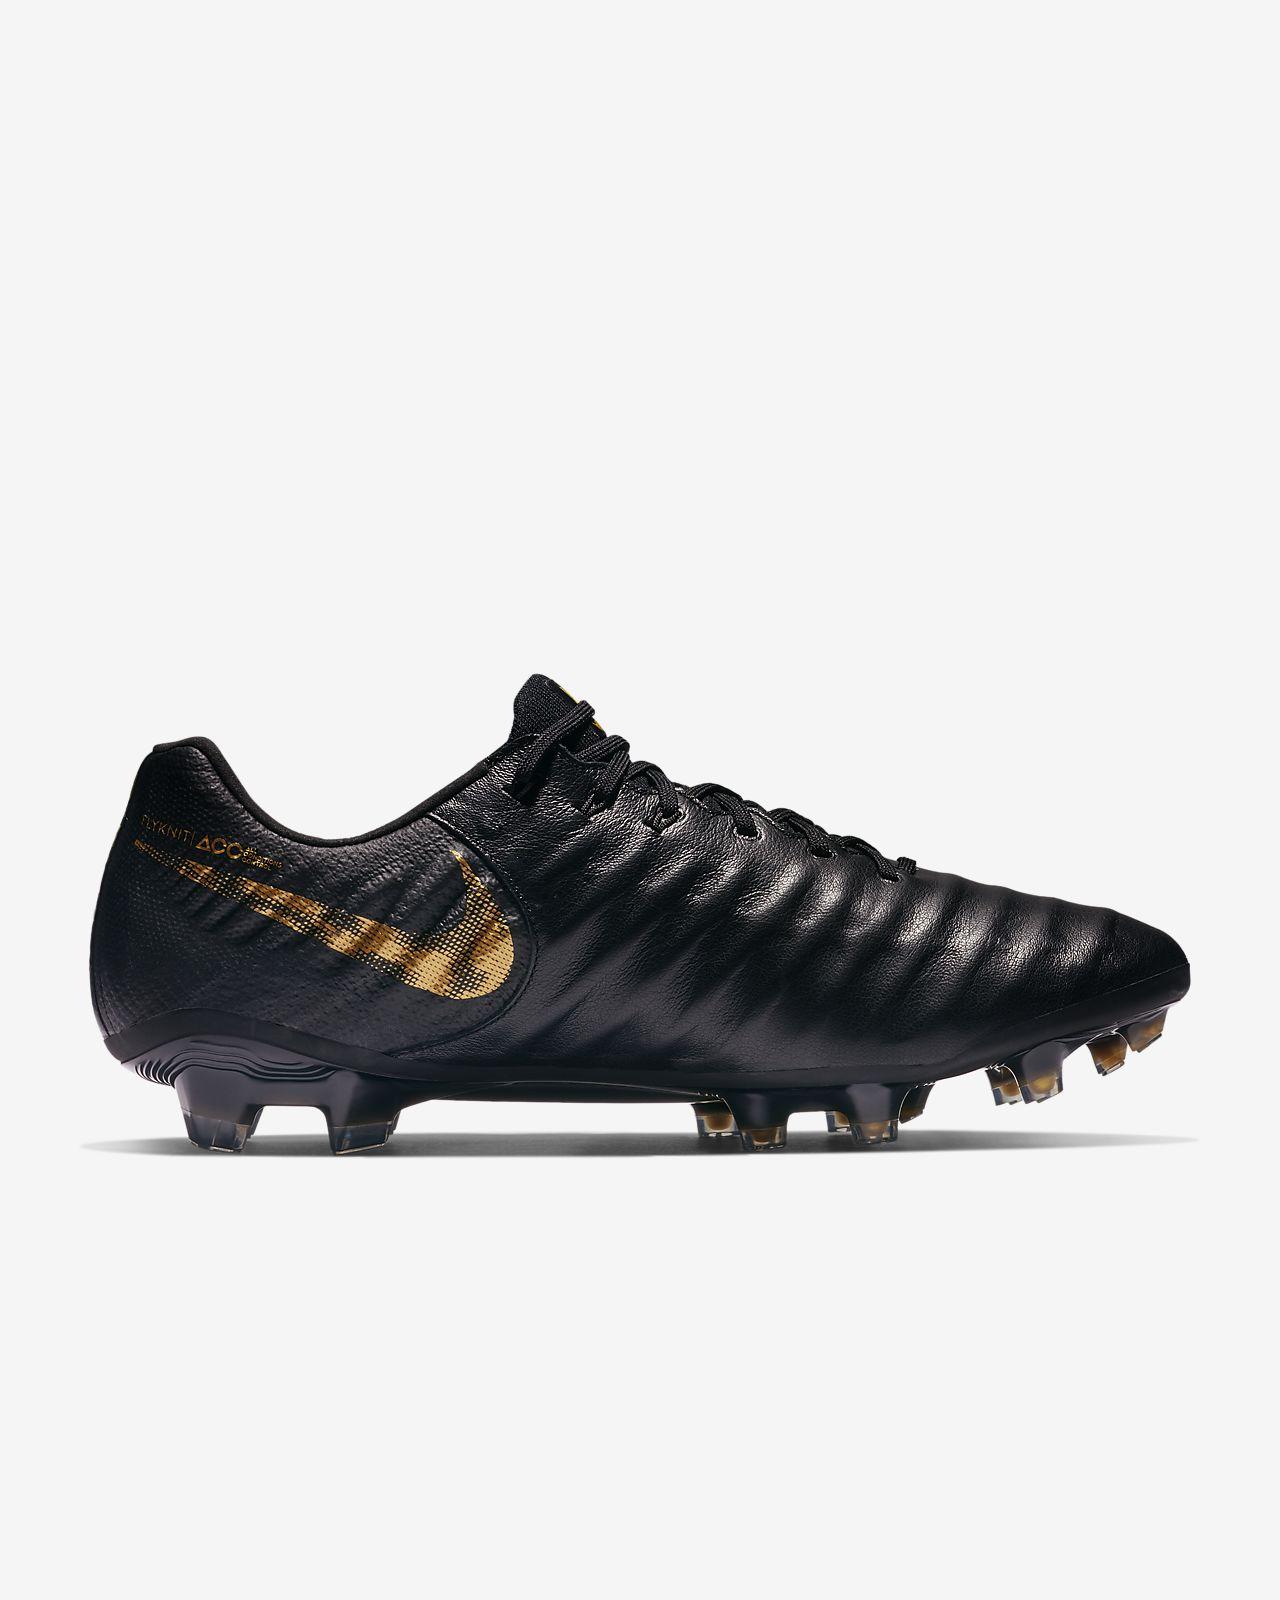 043089b093 ... Chuteiras de futebol para terreno firme Nike Tiempo Legend 7 Elite FG